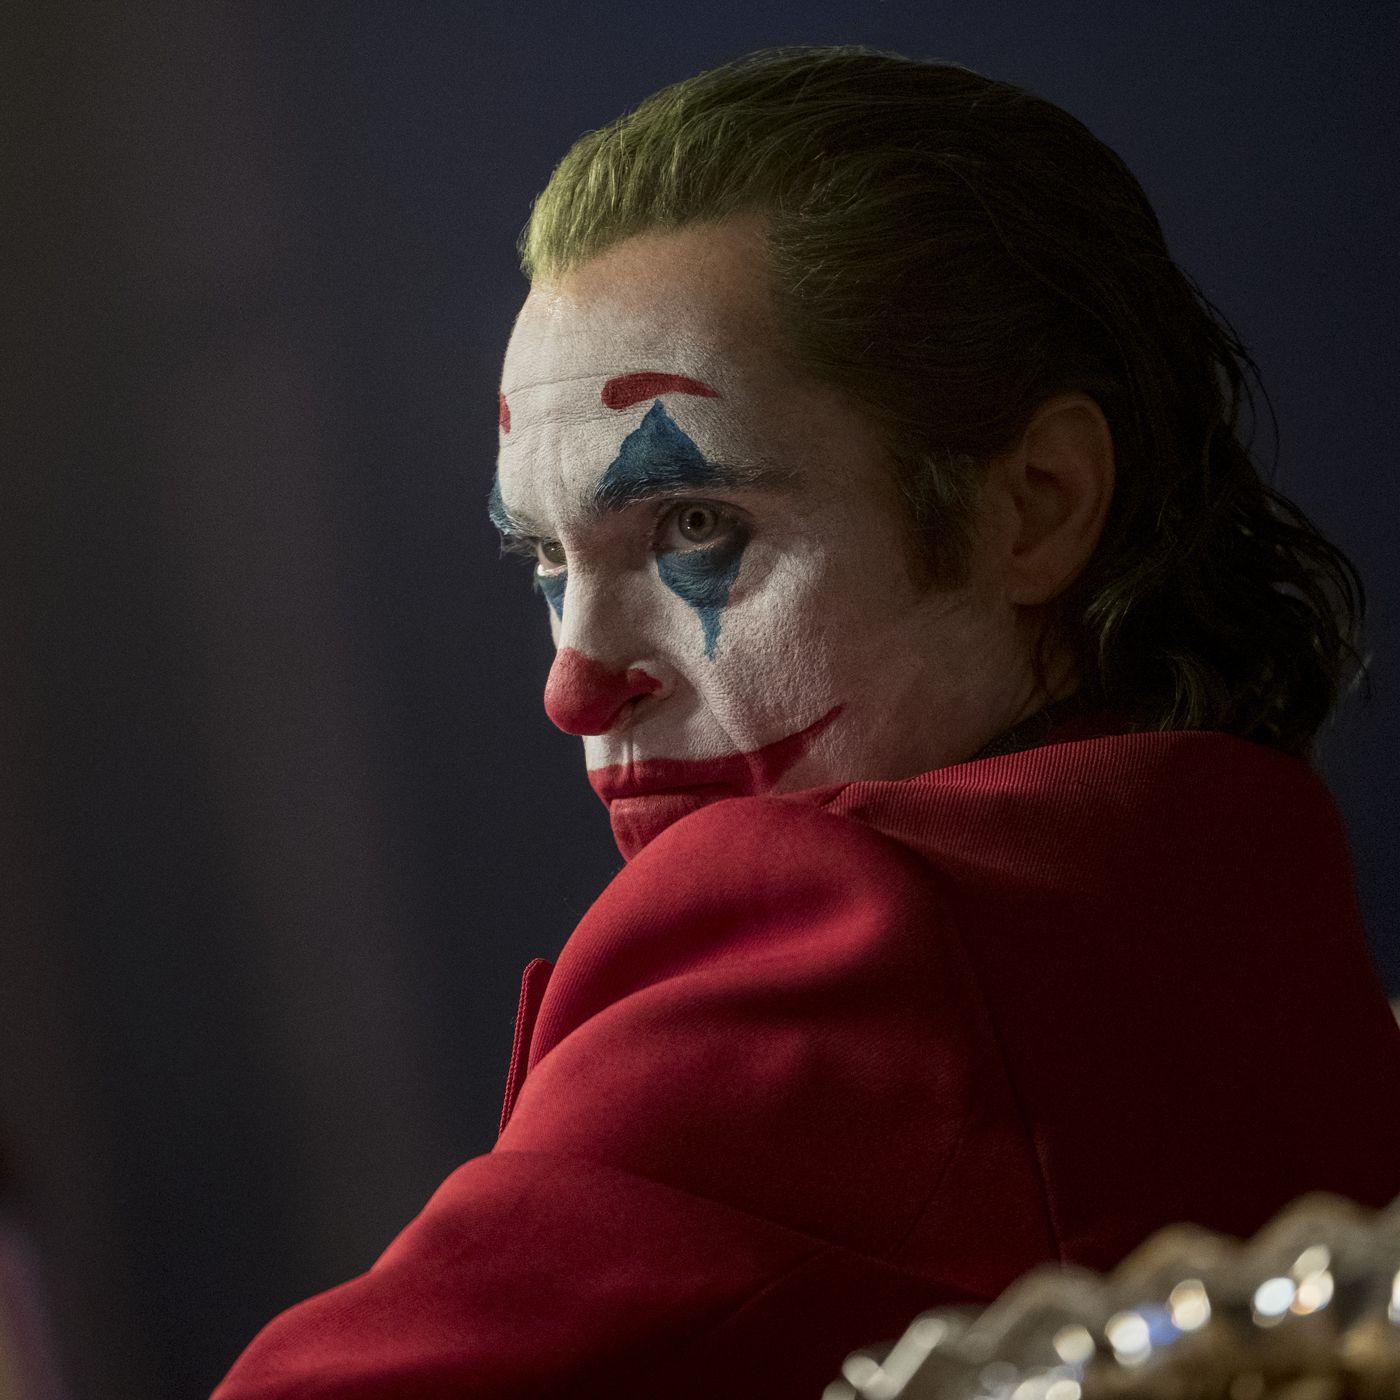 Joker climax scene with Joaquin Phoenix